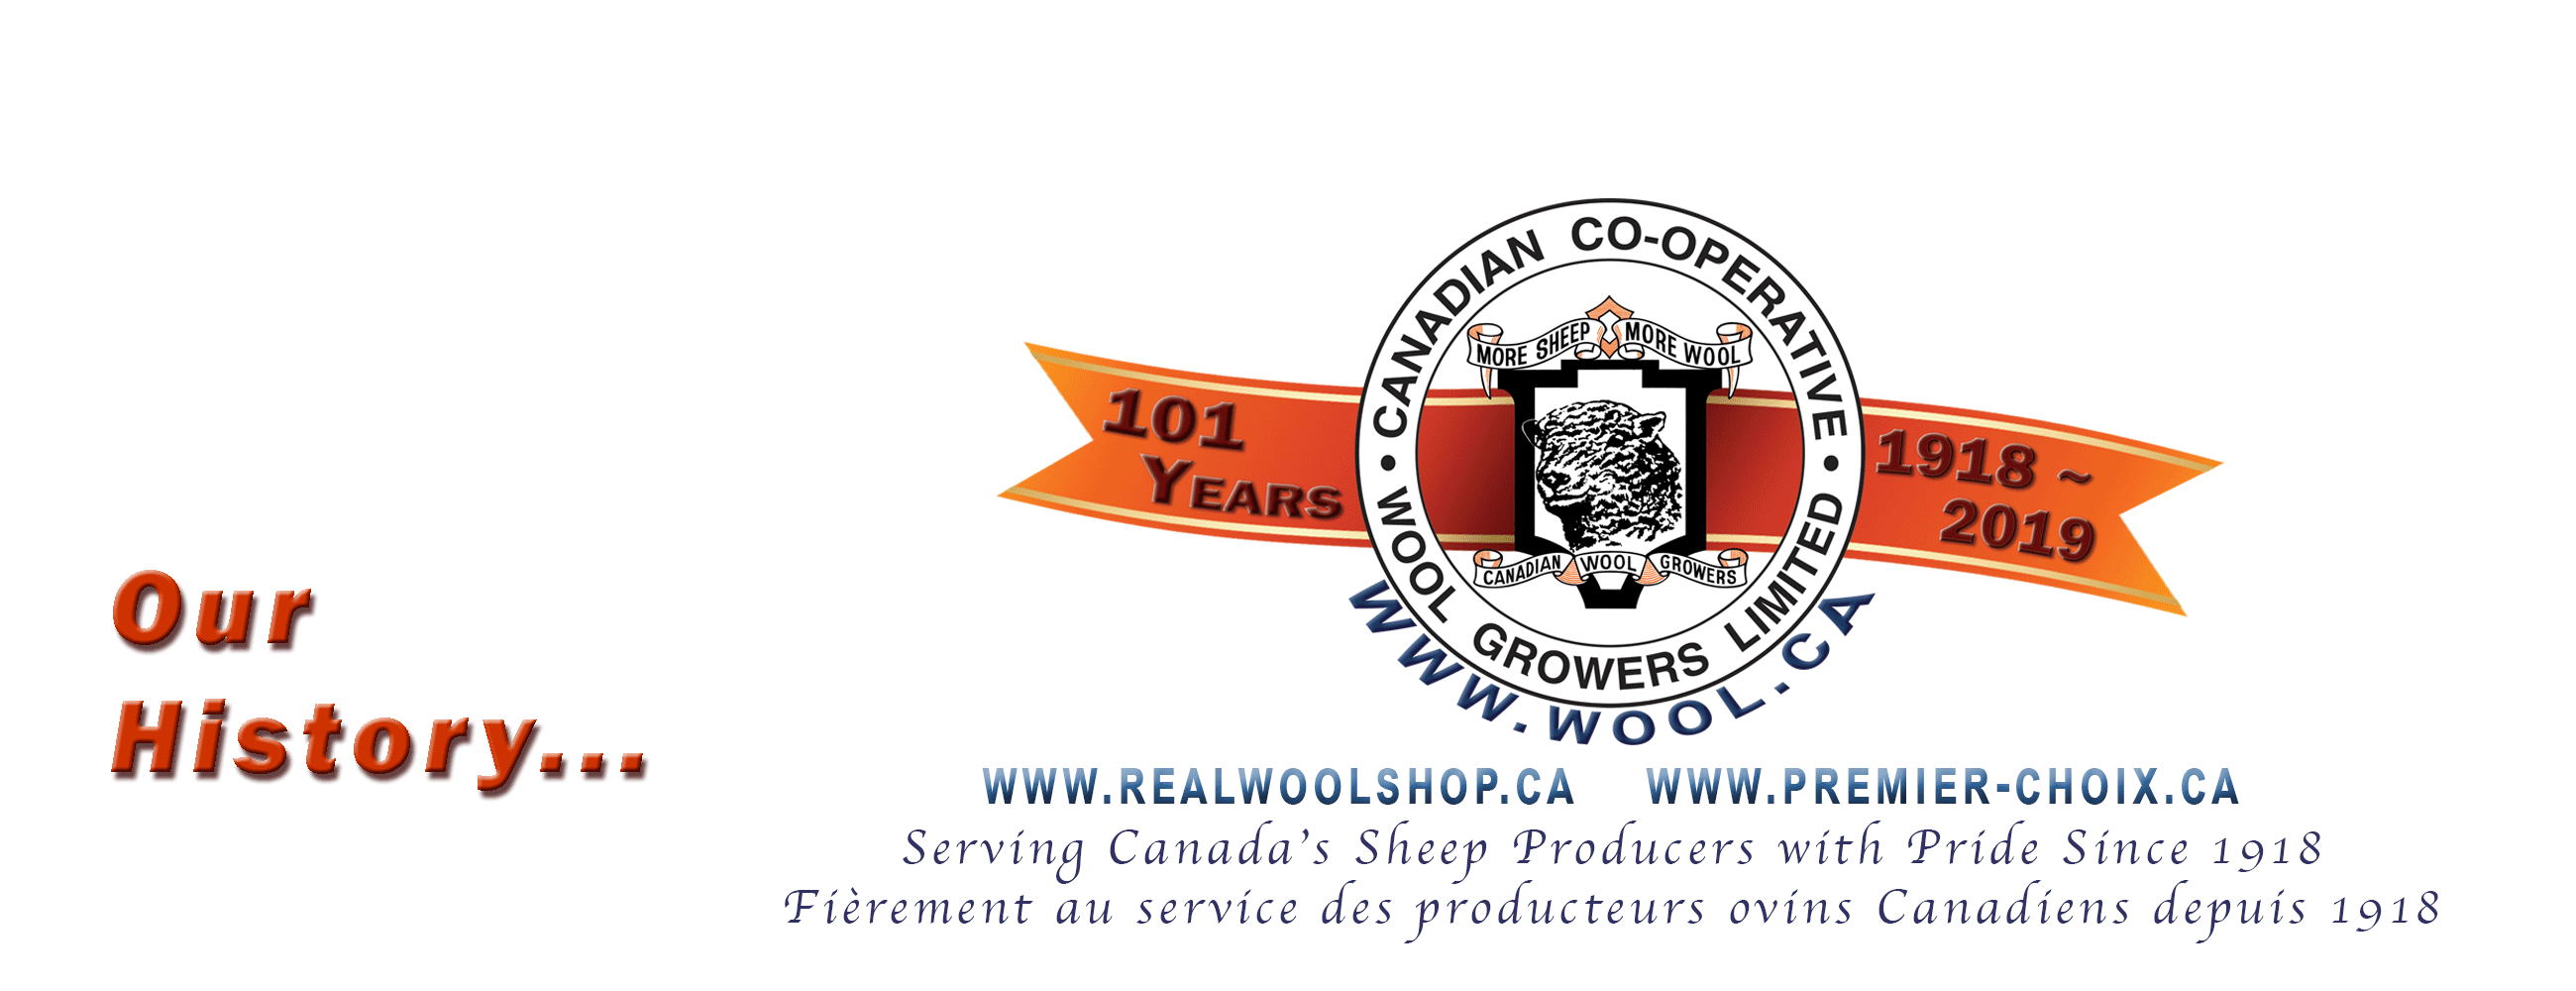 Canadian Sheep Identification Program | Canadian Co-operative Wool